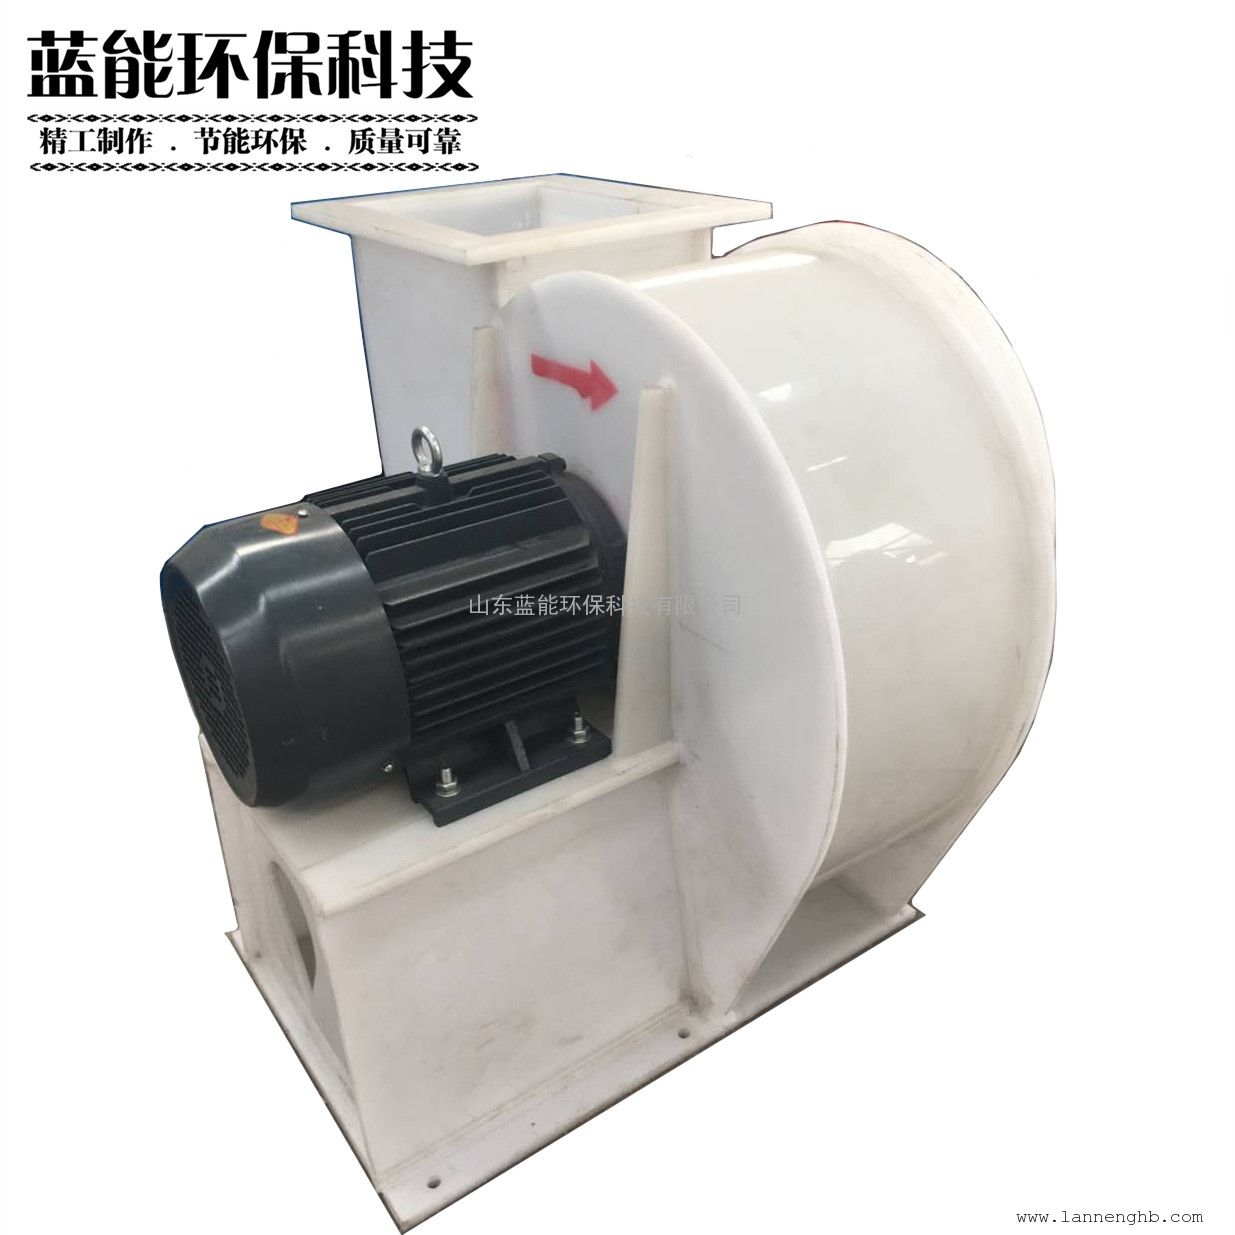 F4-72系列玻璃钢风机 PP风机 塑料风机厂家 山东蓝能